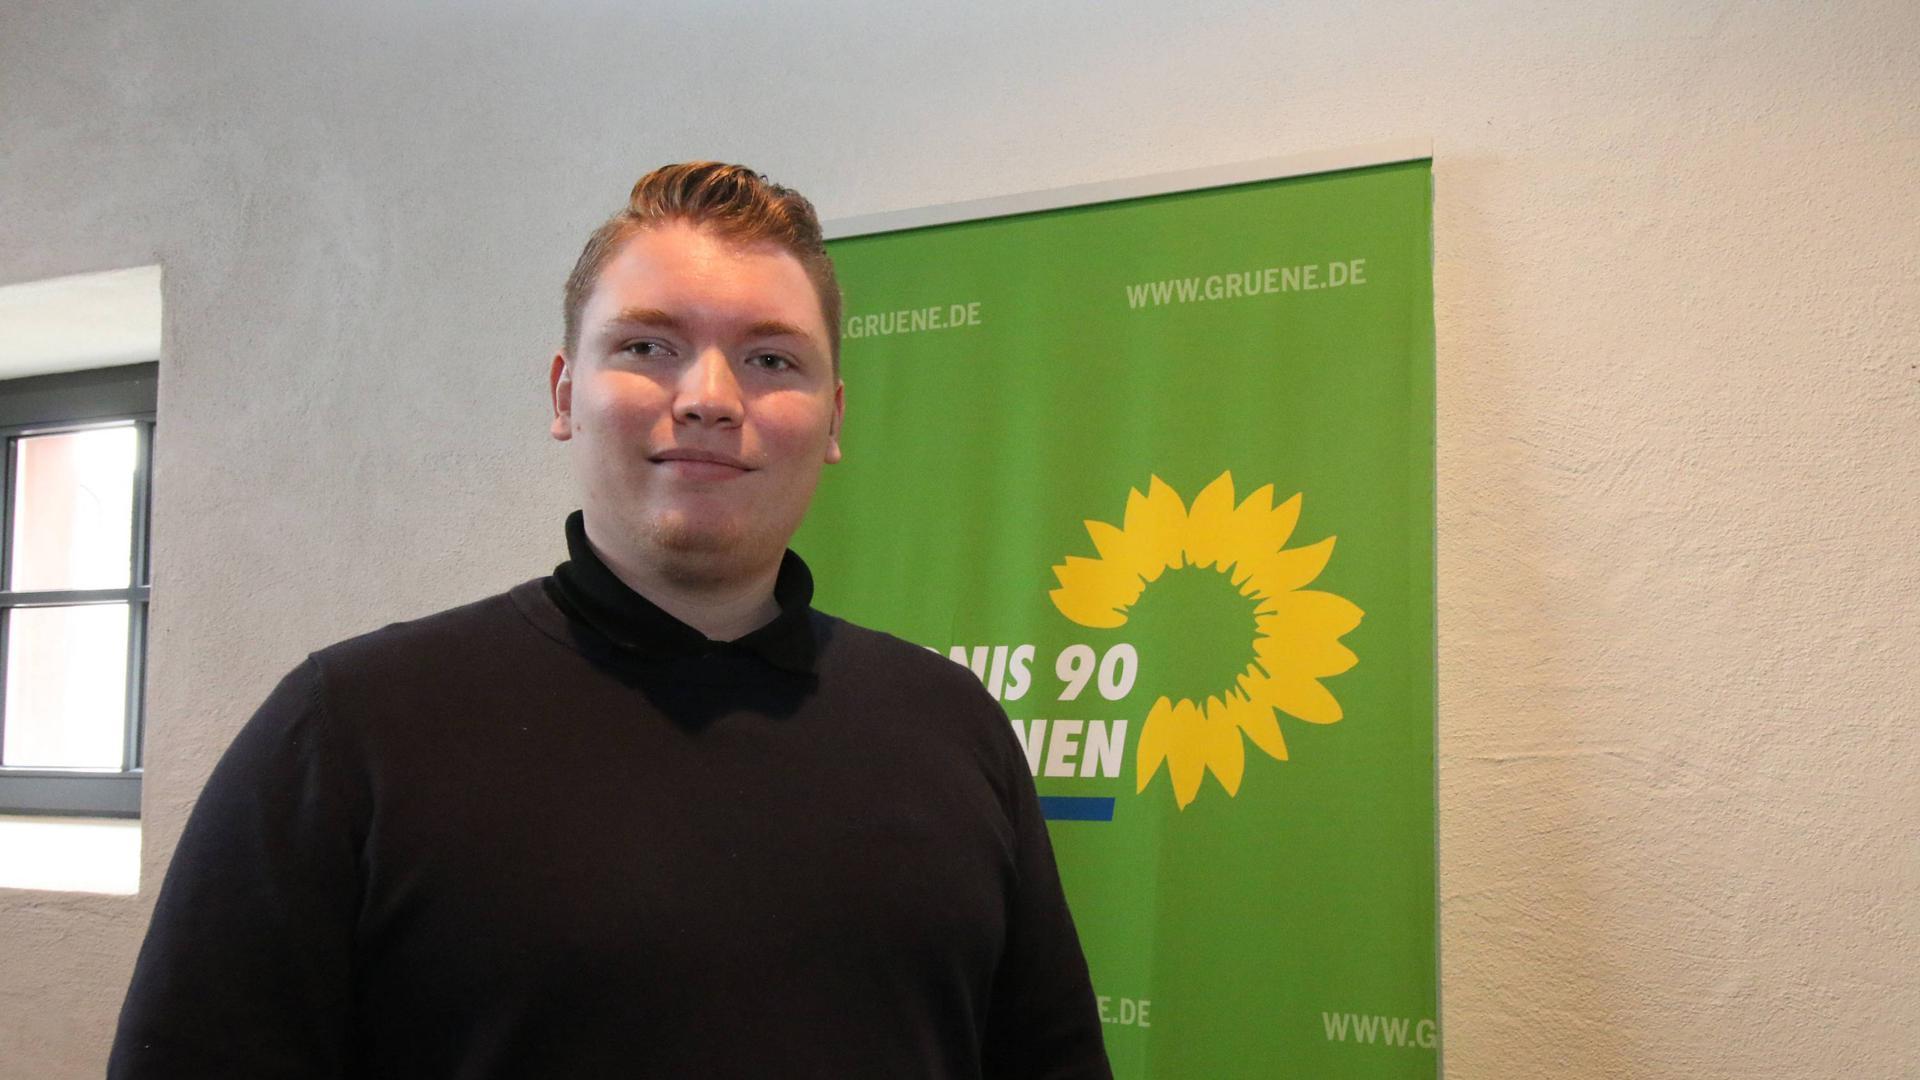 Felix Herkens will Landtagsabgeordneter der  Pforheimer Grünen werden.